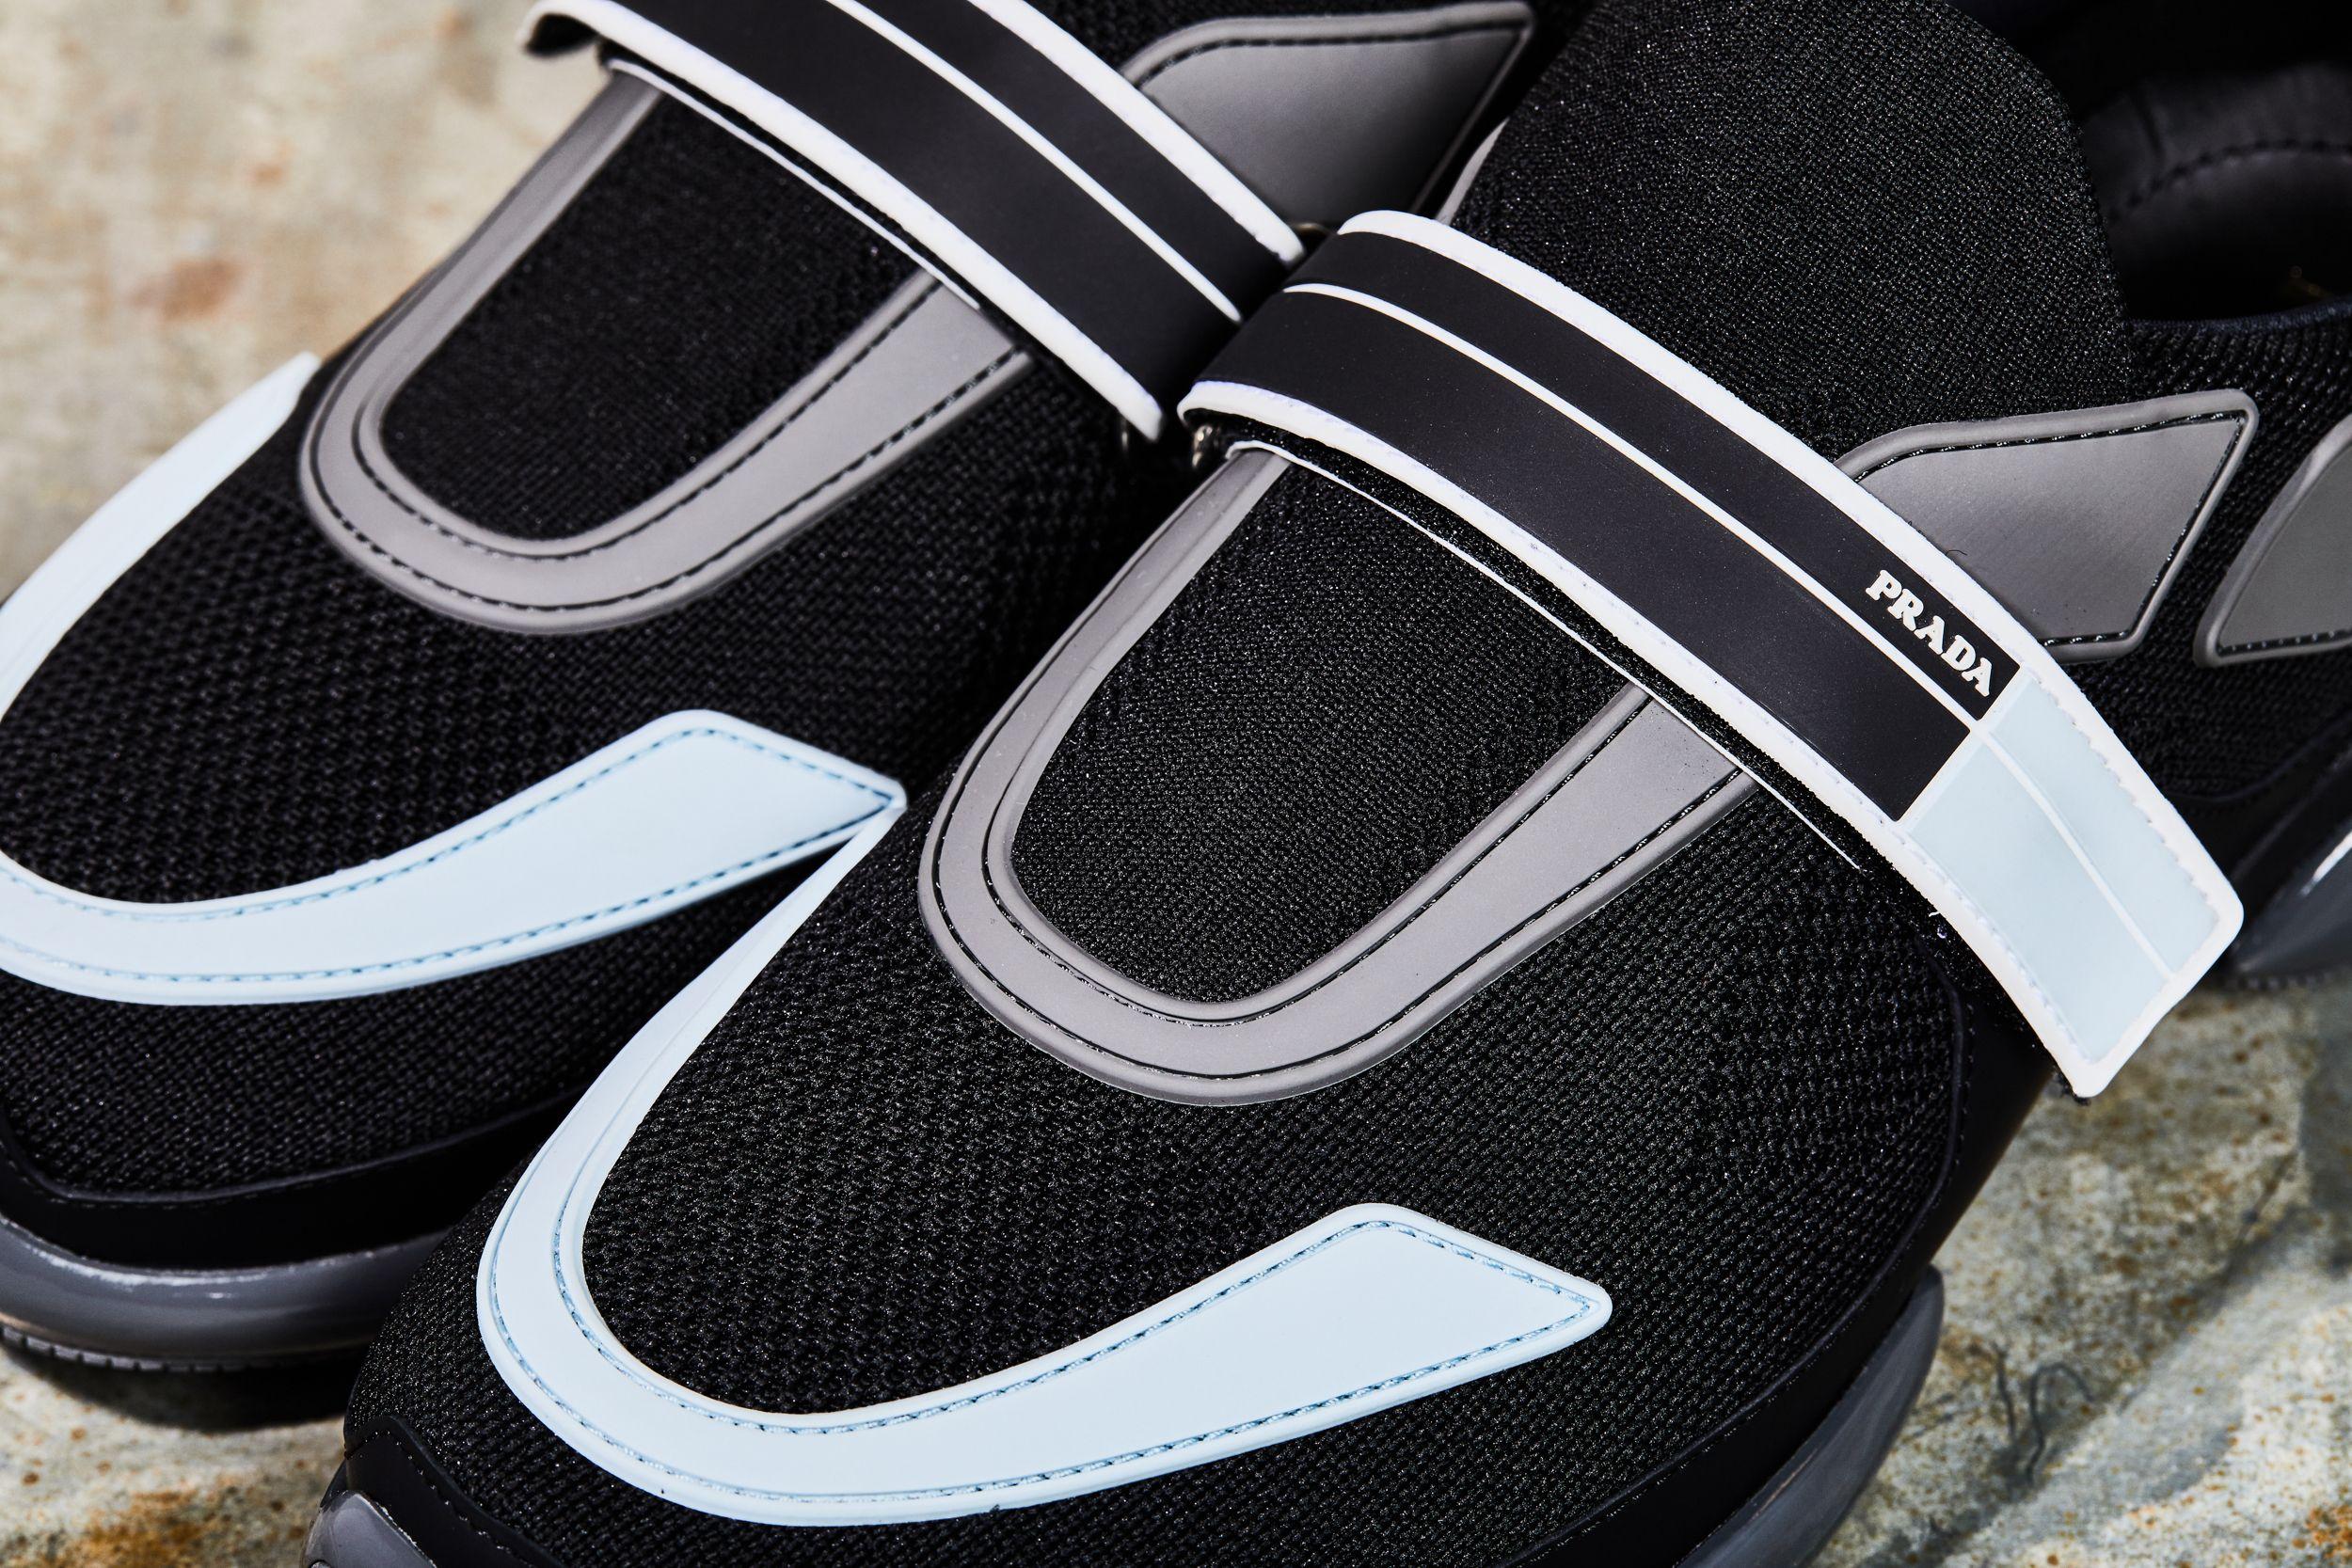 Prada's New Cloudbust Sneakers Are